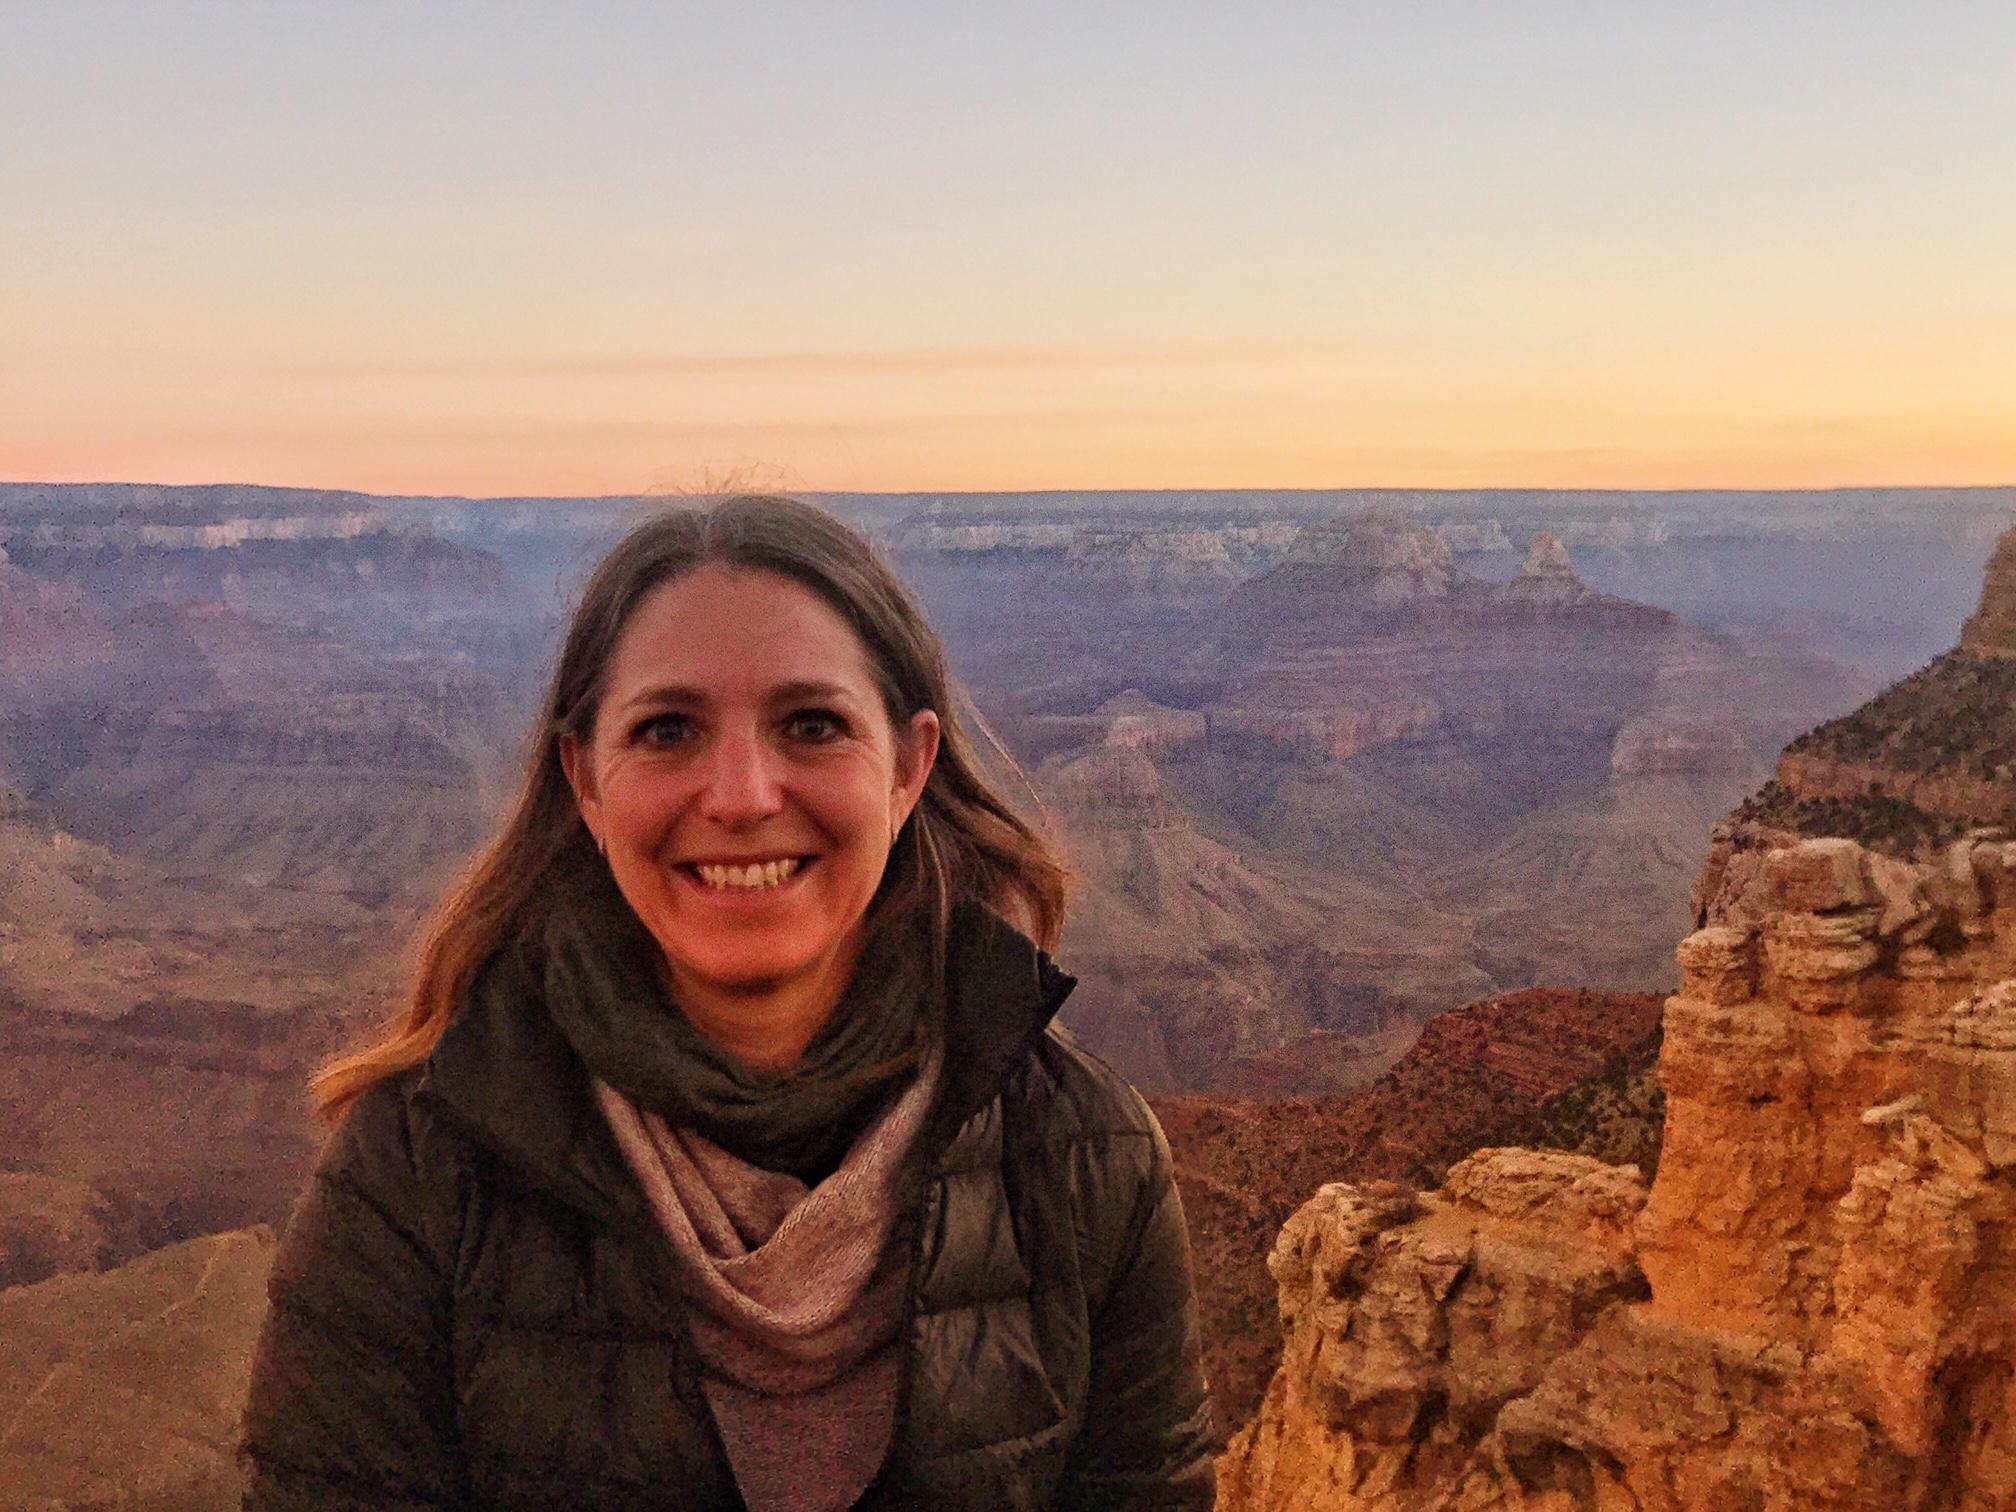 Danielle at the Grand Canyon, South Rim. Arizona.